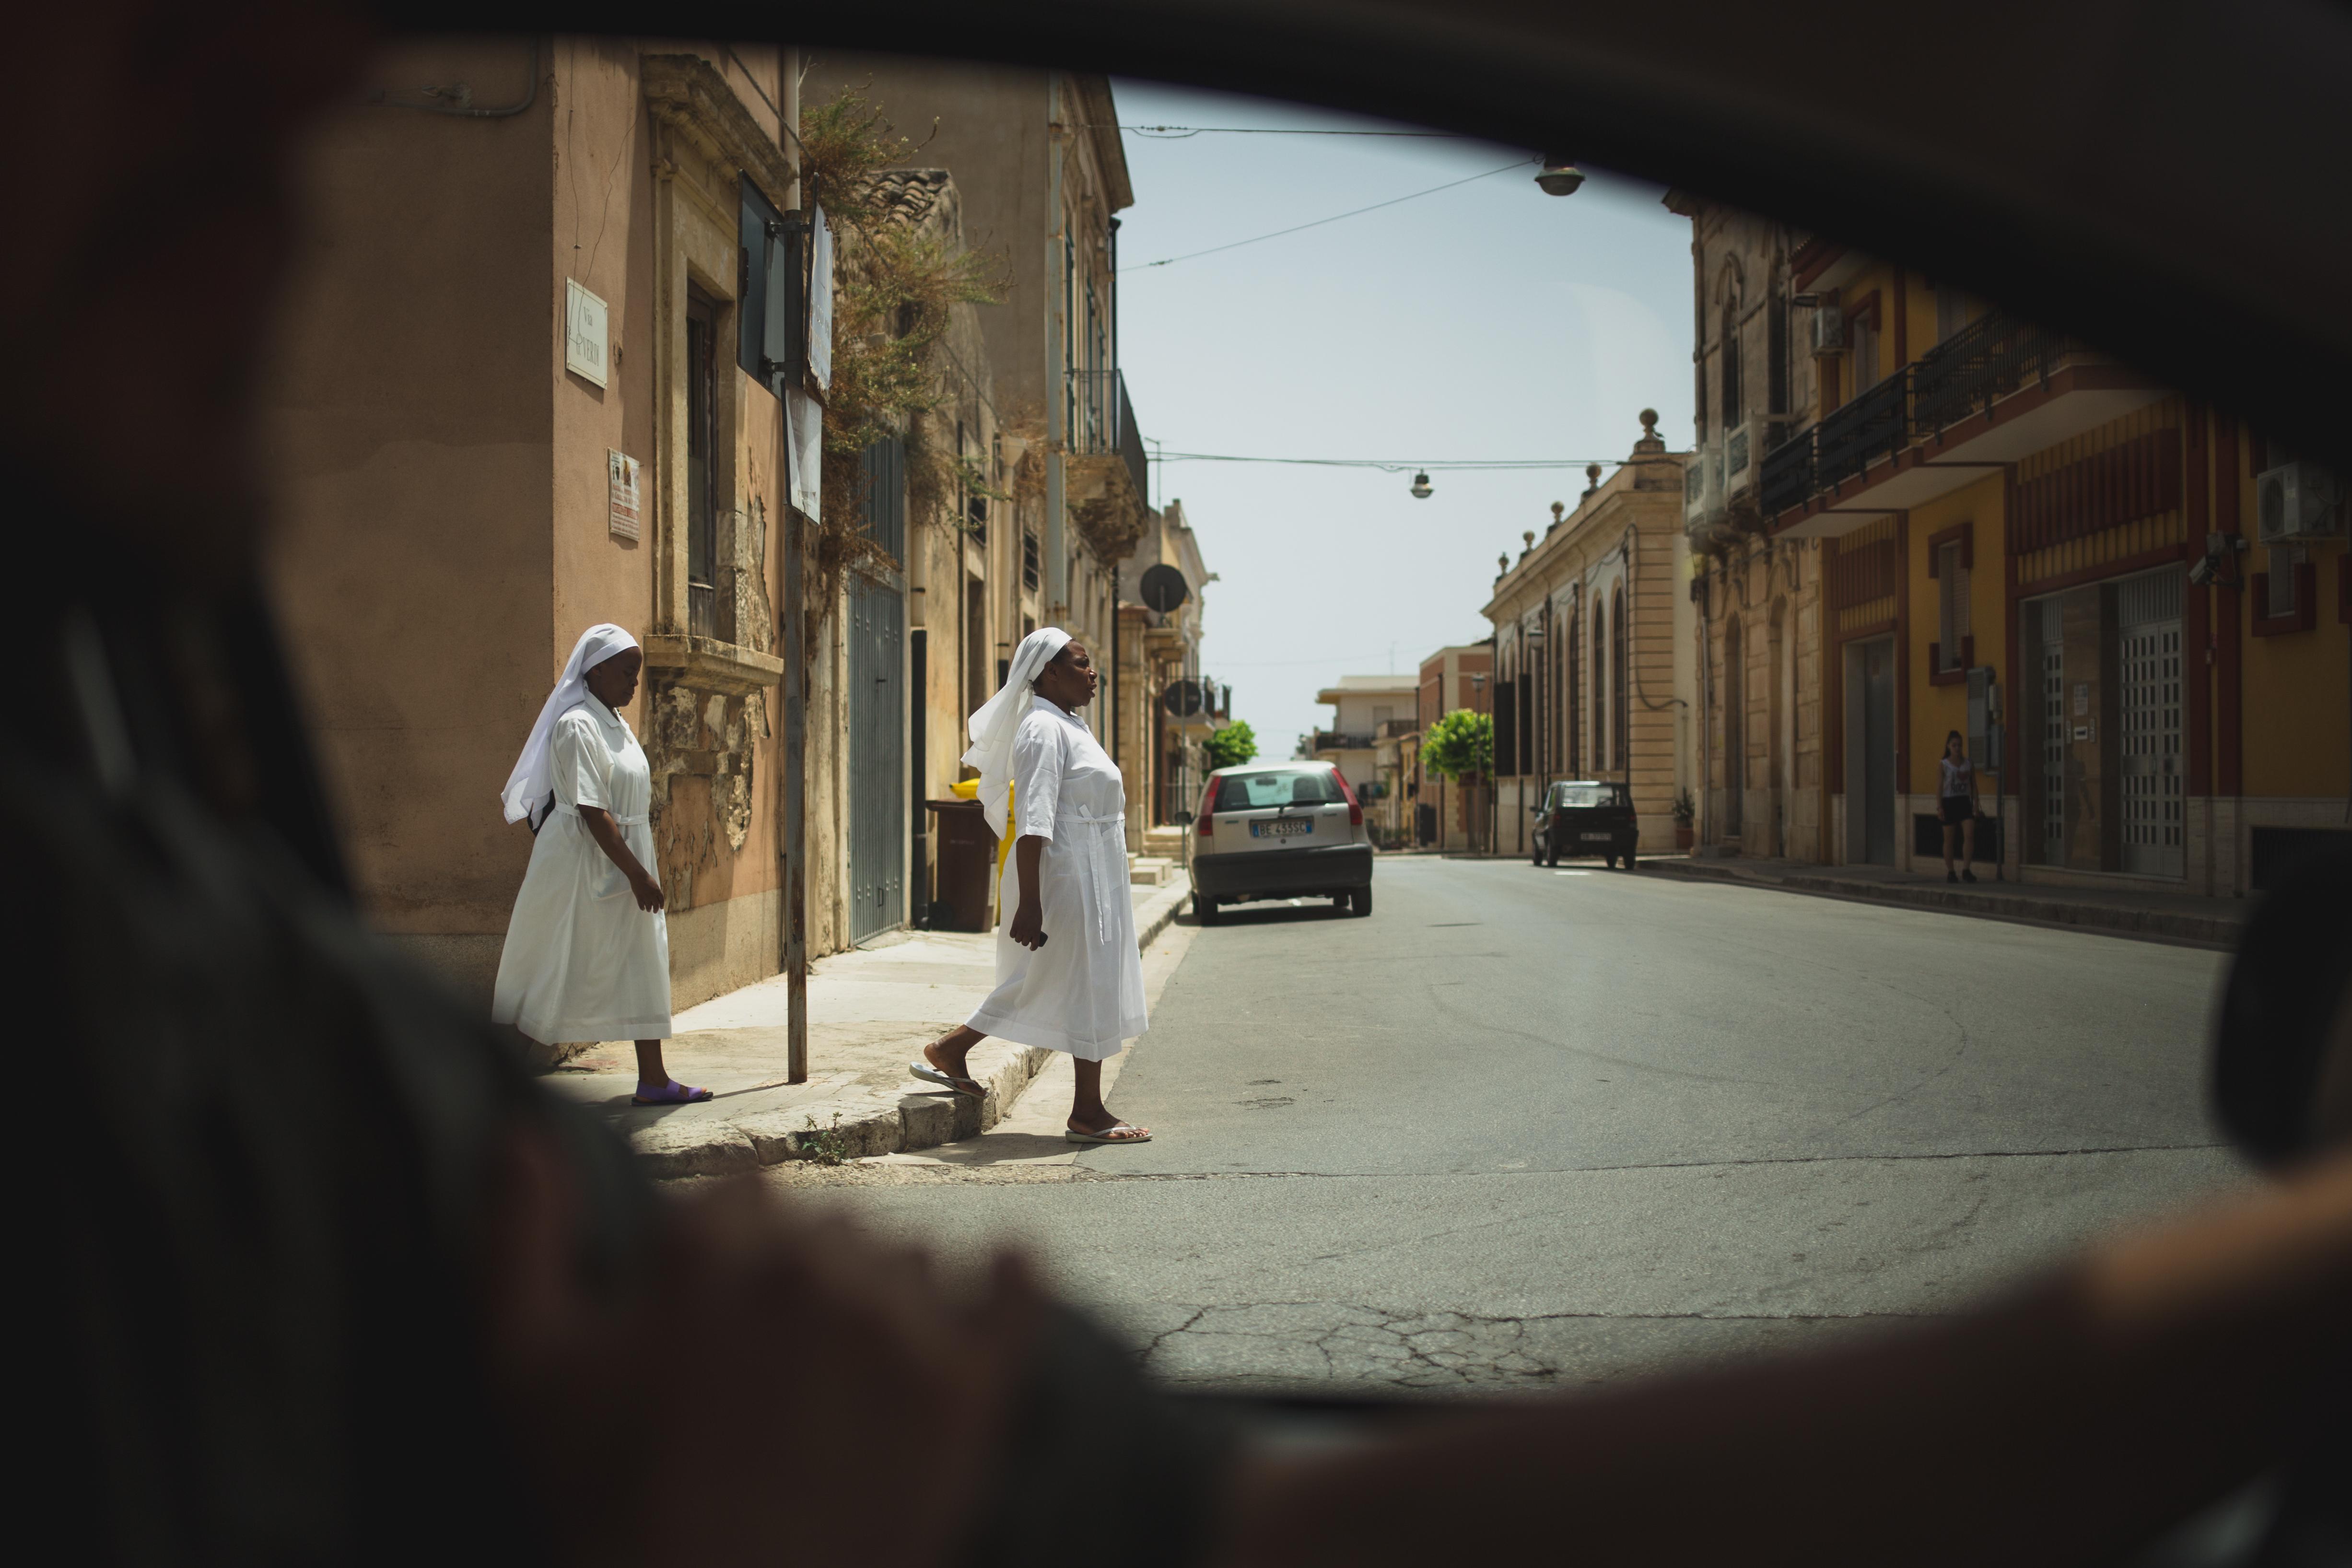 Sicily, Sizilien, Carolin Weinkopf